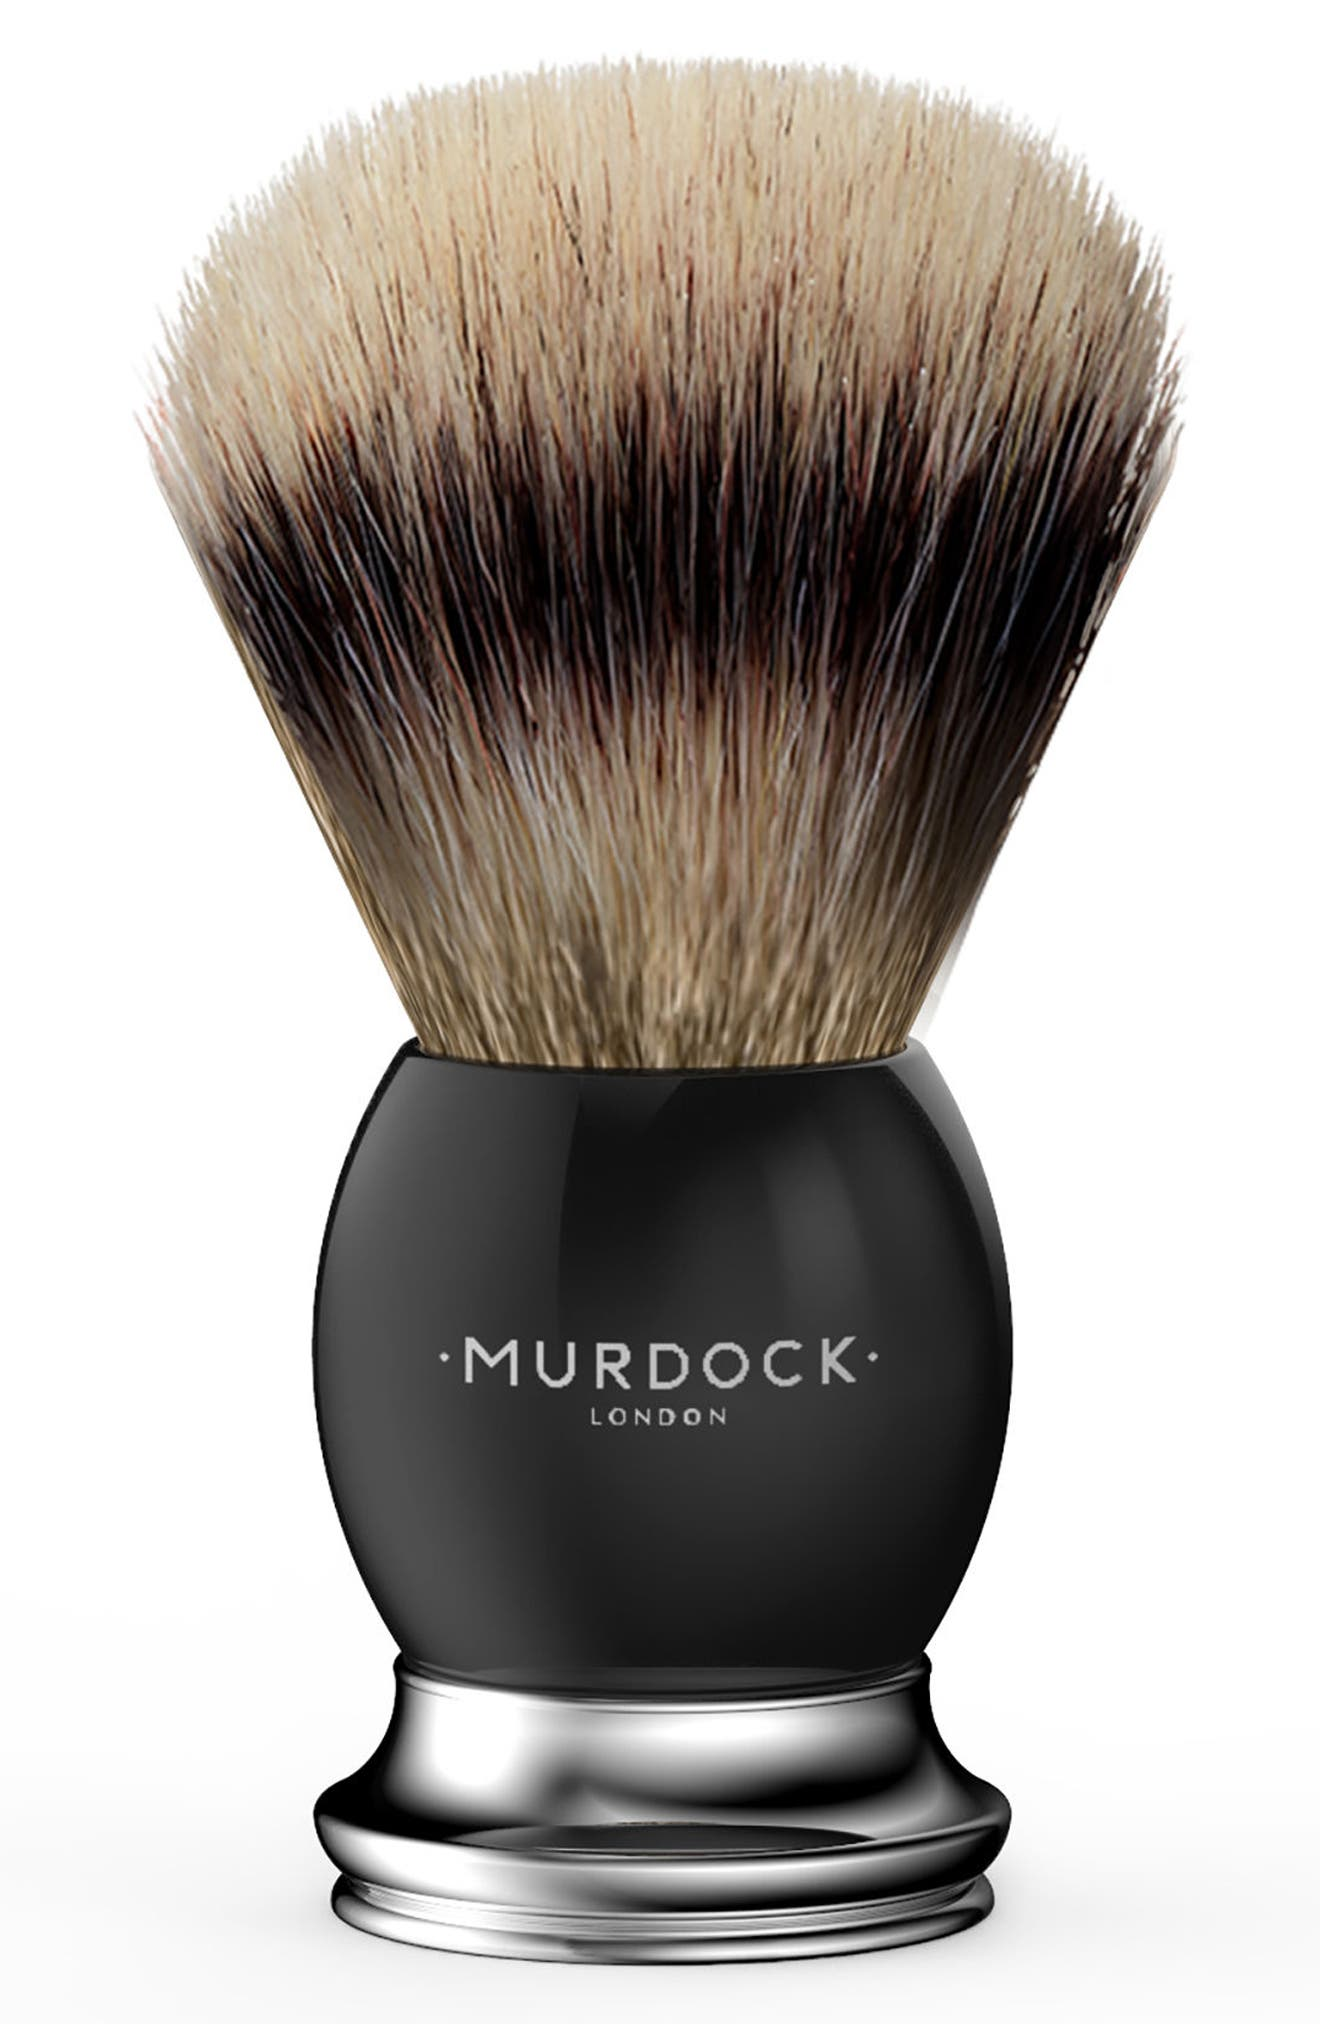 Murdock London Windsor Silver Badger Brush (Nordstrom Exclusive)